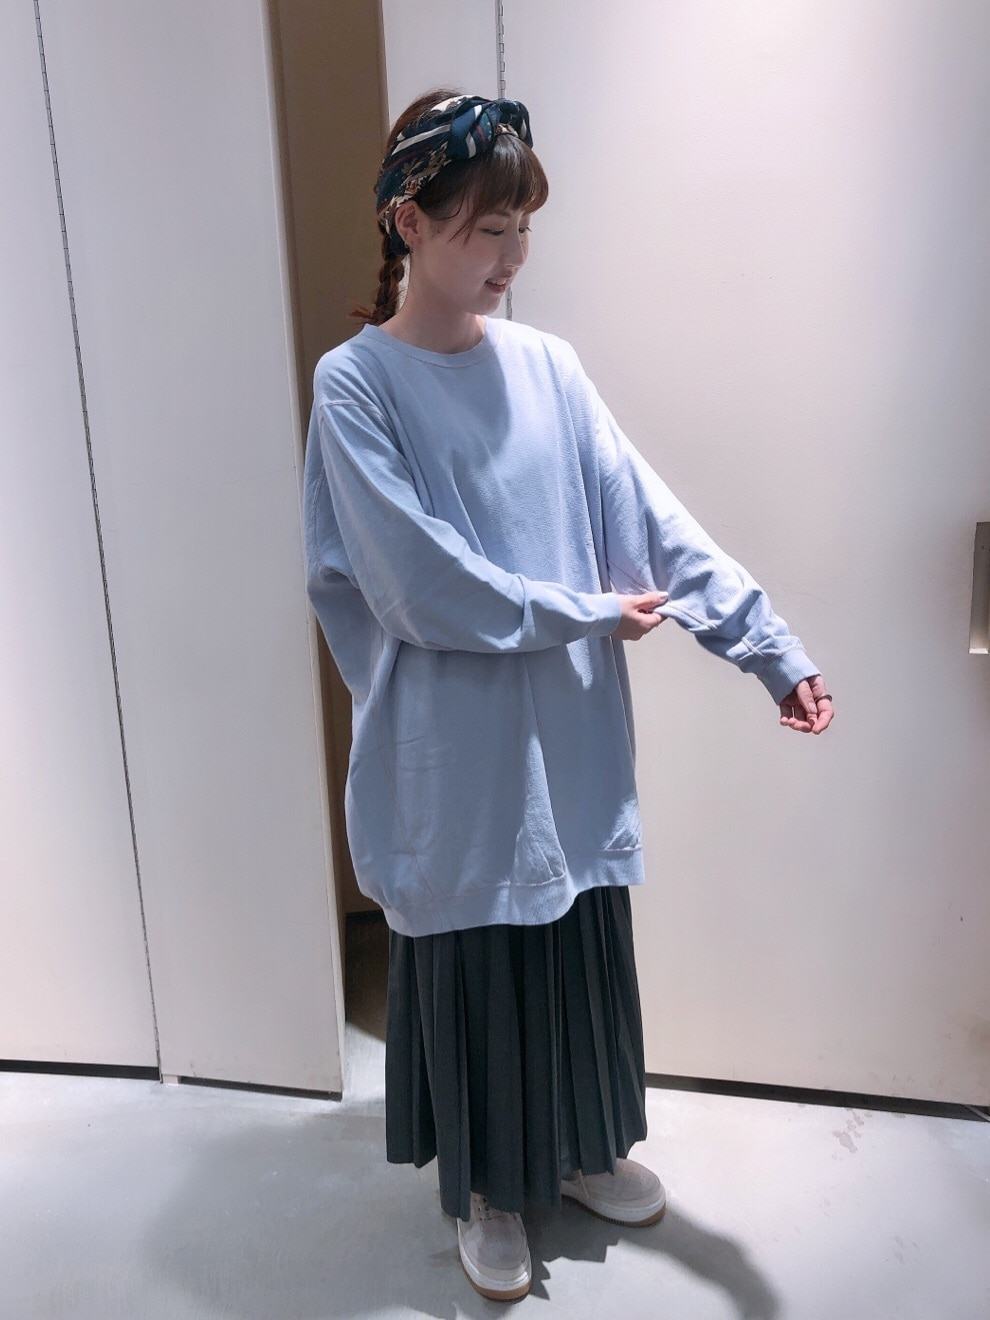 bulle de savon 阪急西宮ガーデンズ 身長:155cm 2019.08.16